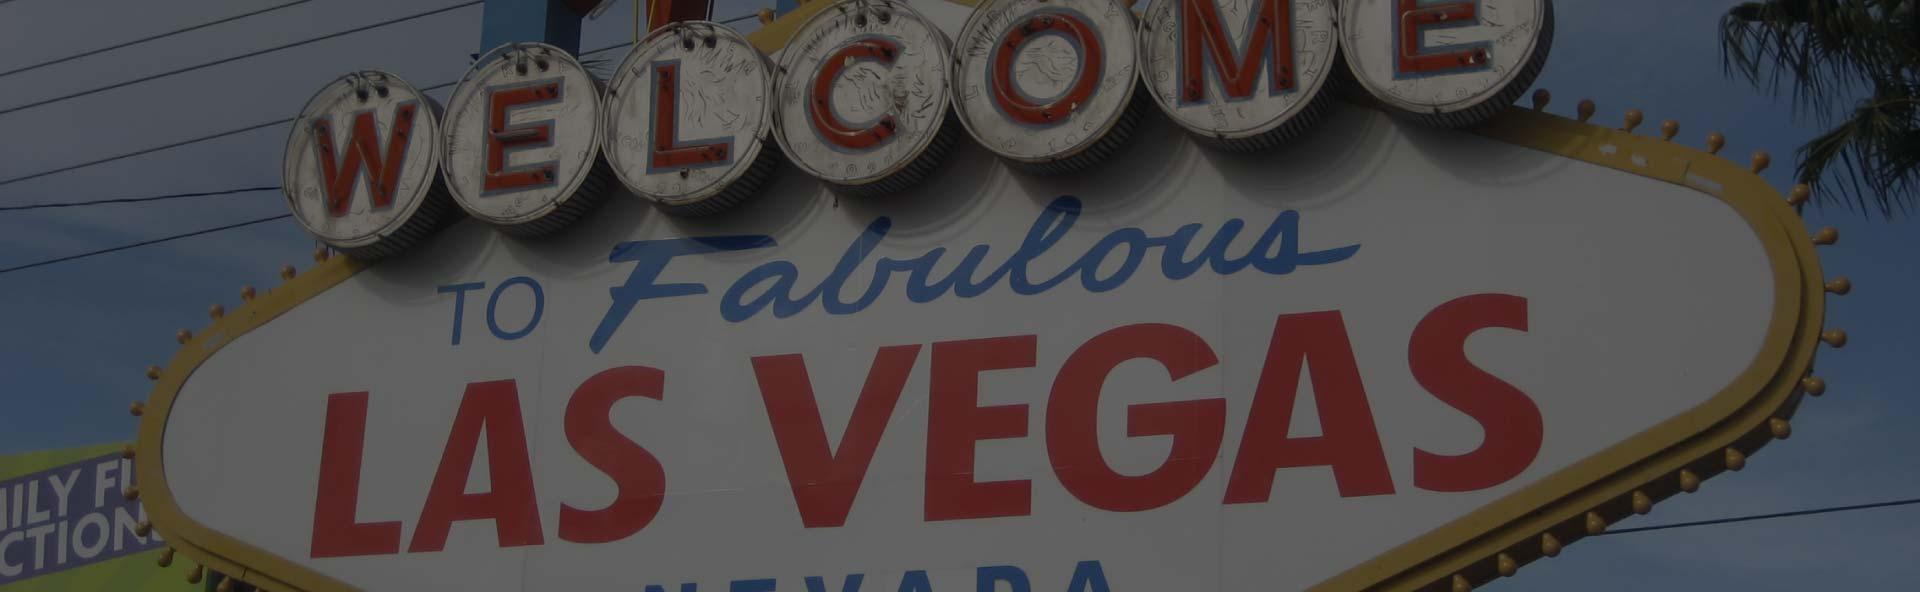 Weclome to NAHREP Las Vegas Chapter